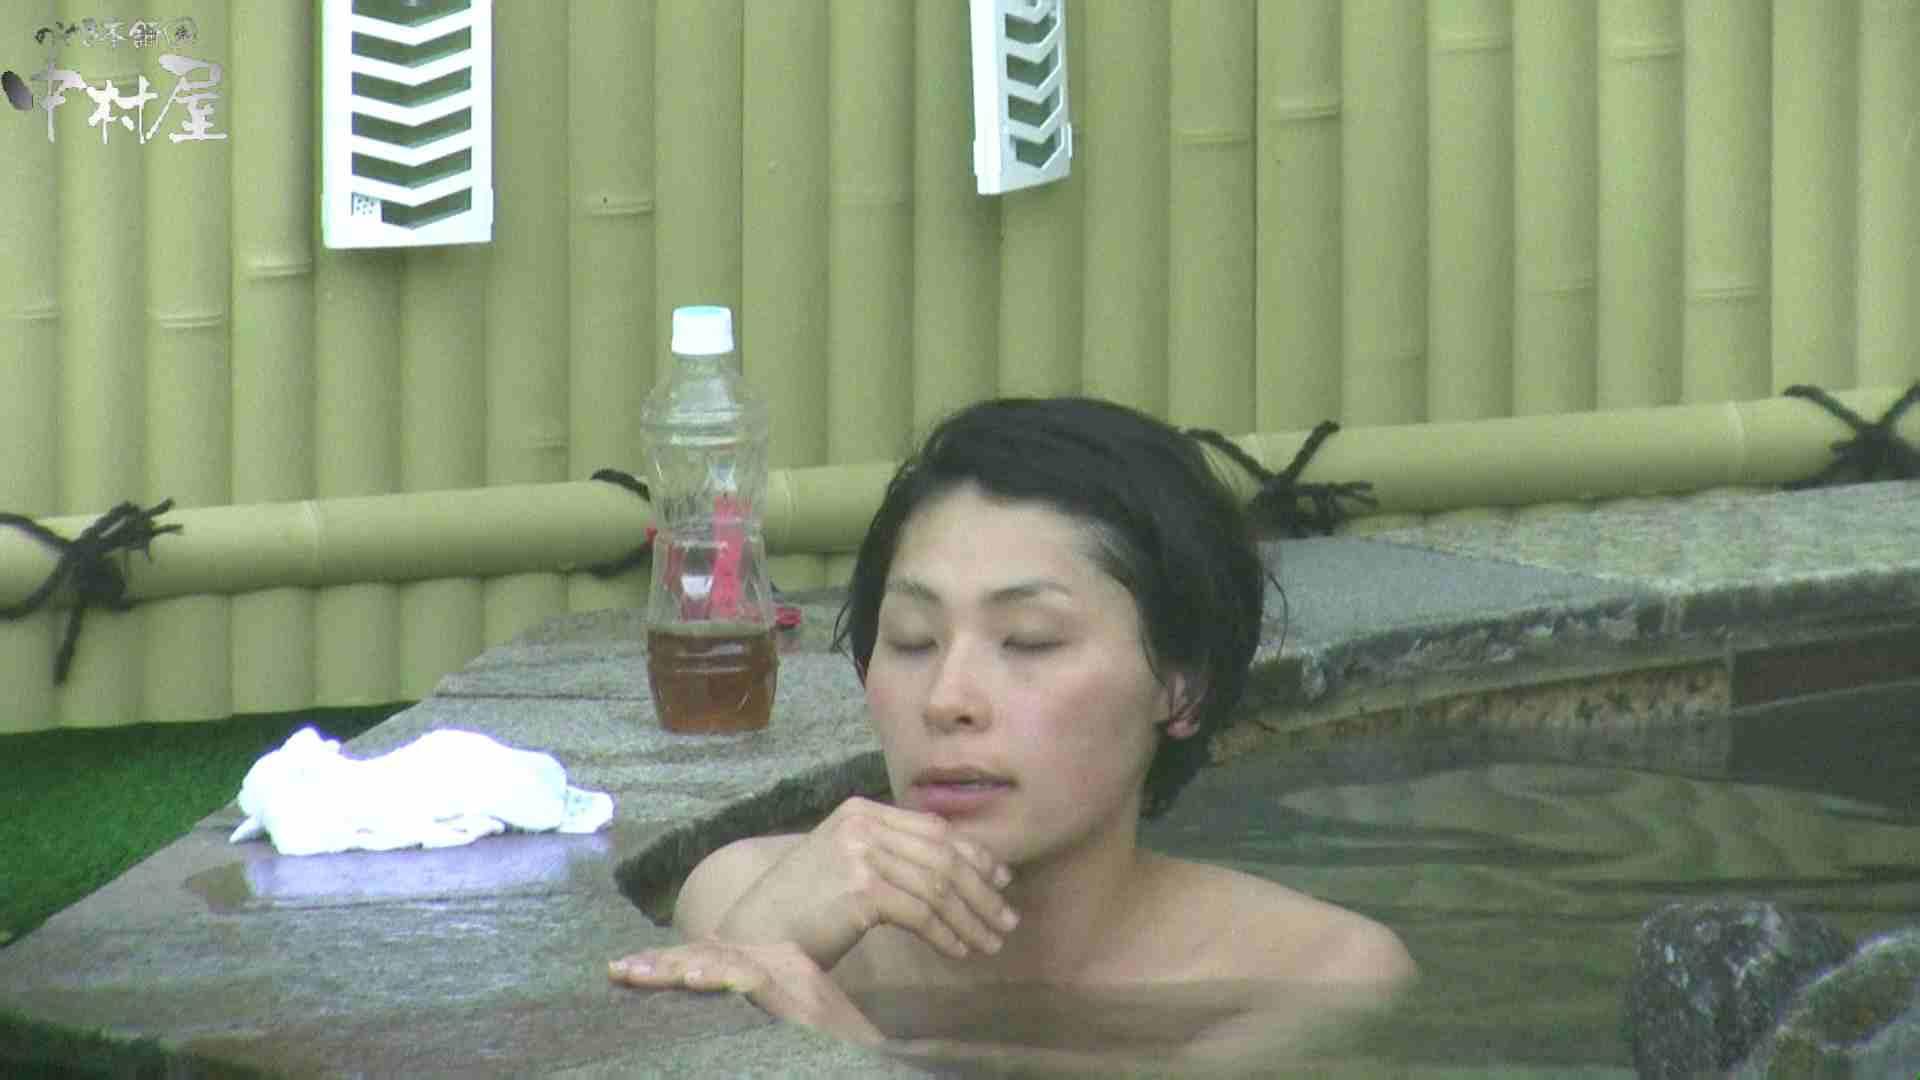 Aquaな露天風呂Vol.970 露天 | OLセックス  97画像 4